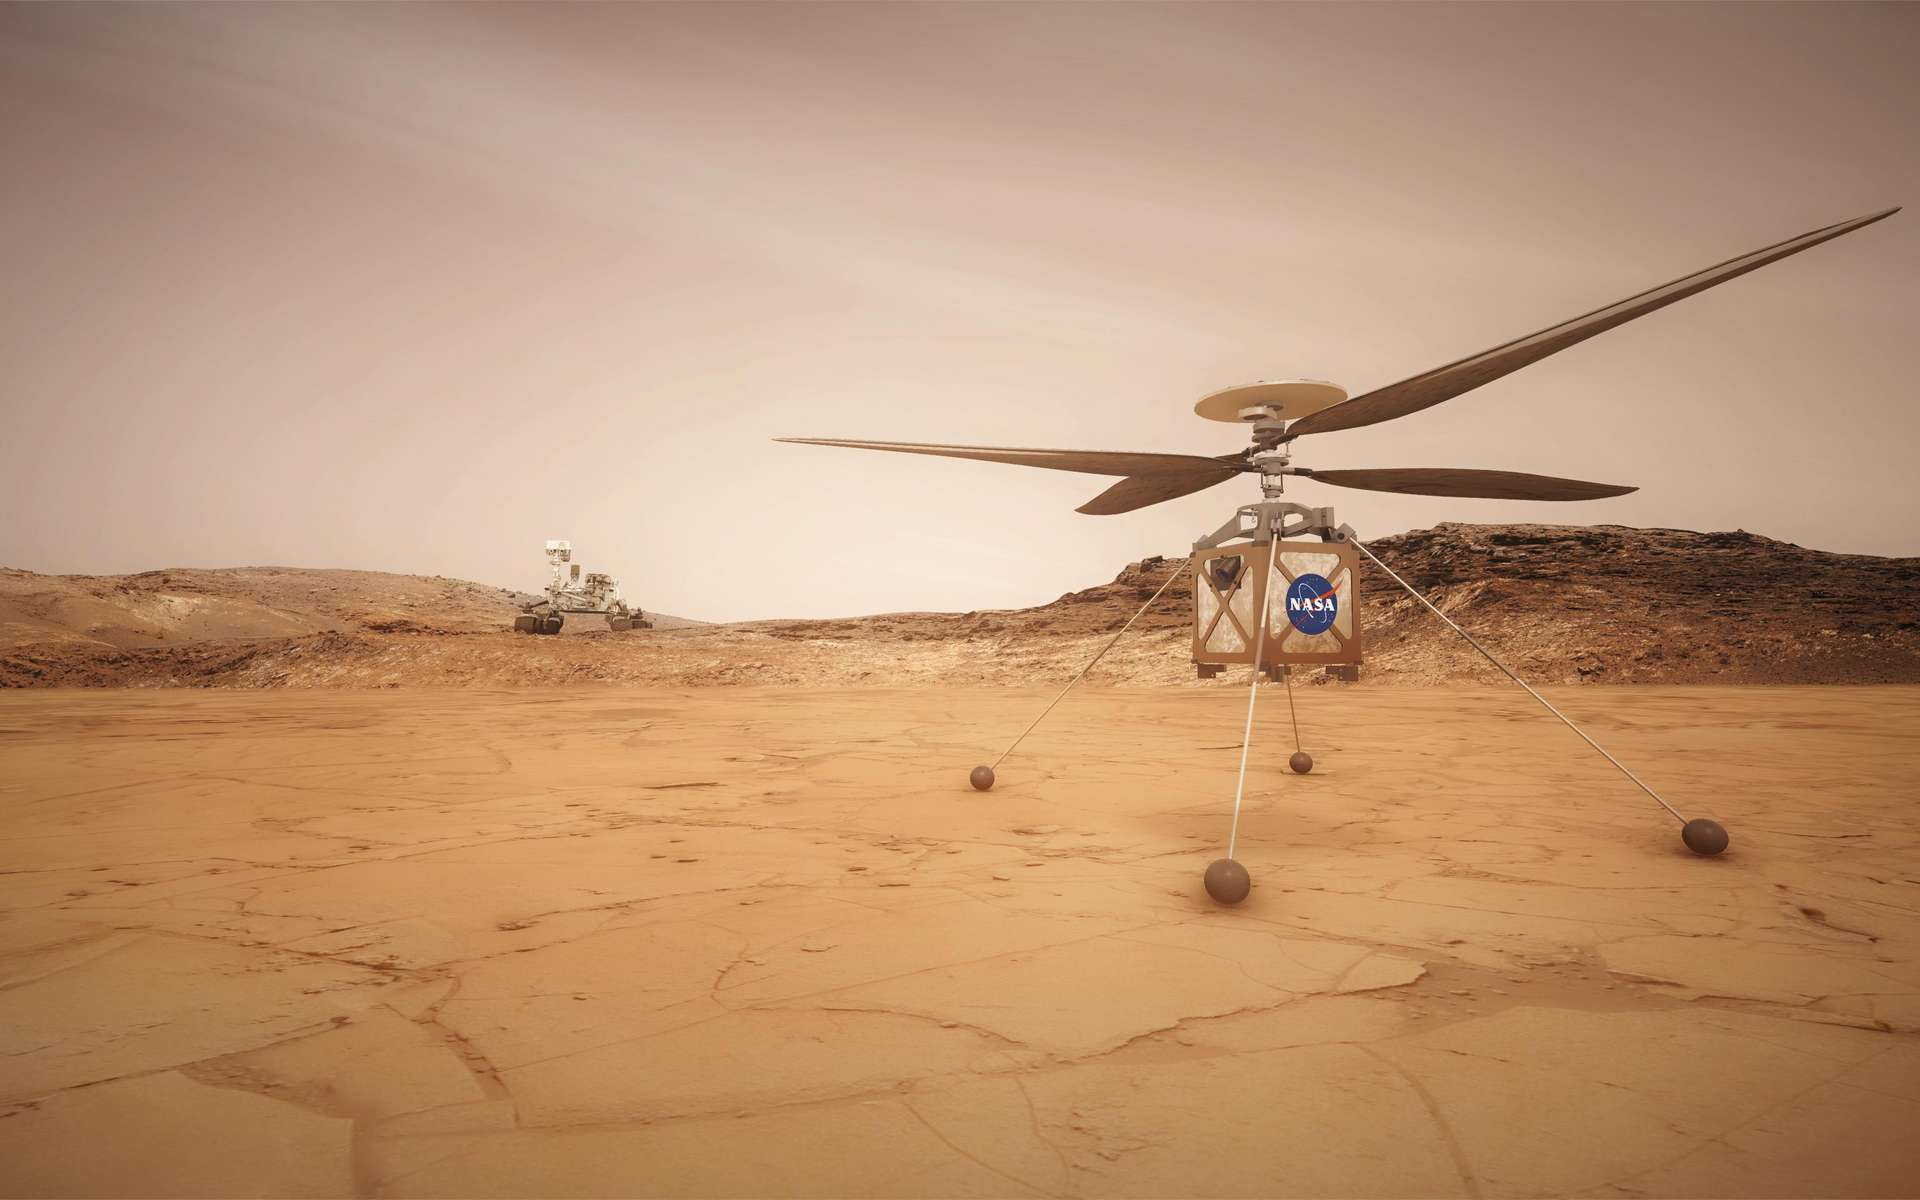 Vue d'artiste du Mars Helicopter développé par Bob Balaram et son équipe. © Nasa, JPL-Caltech